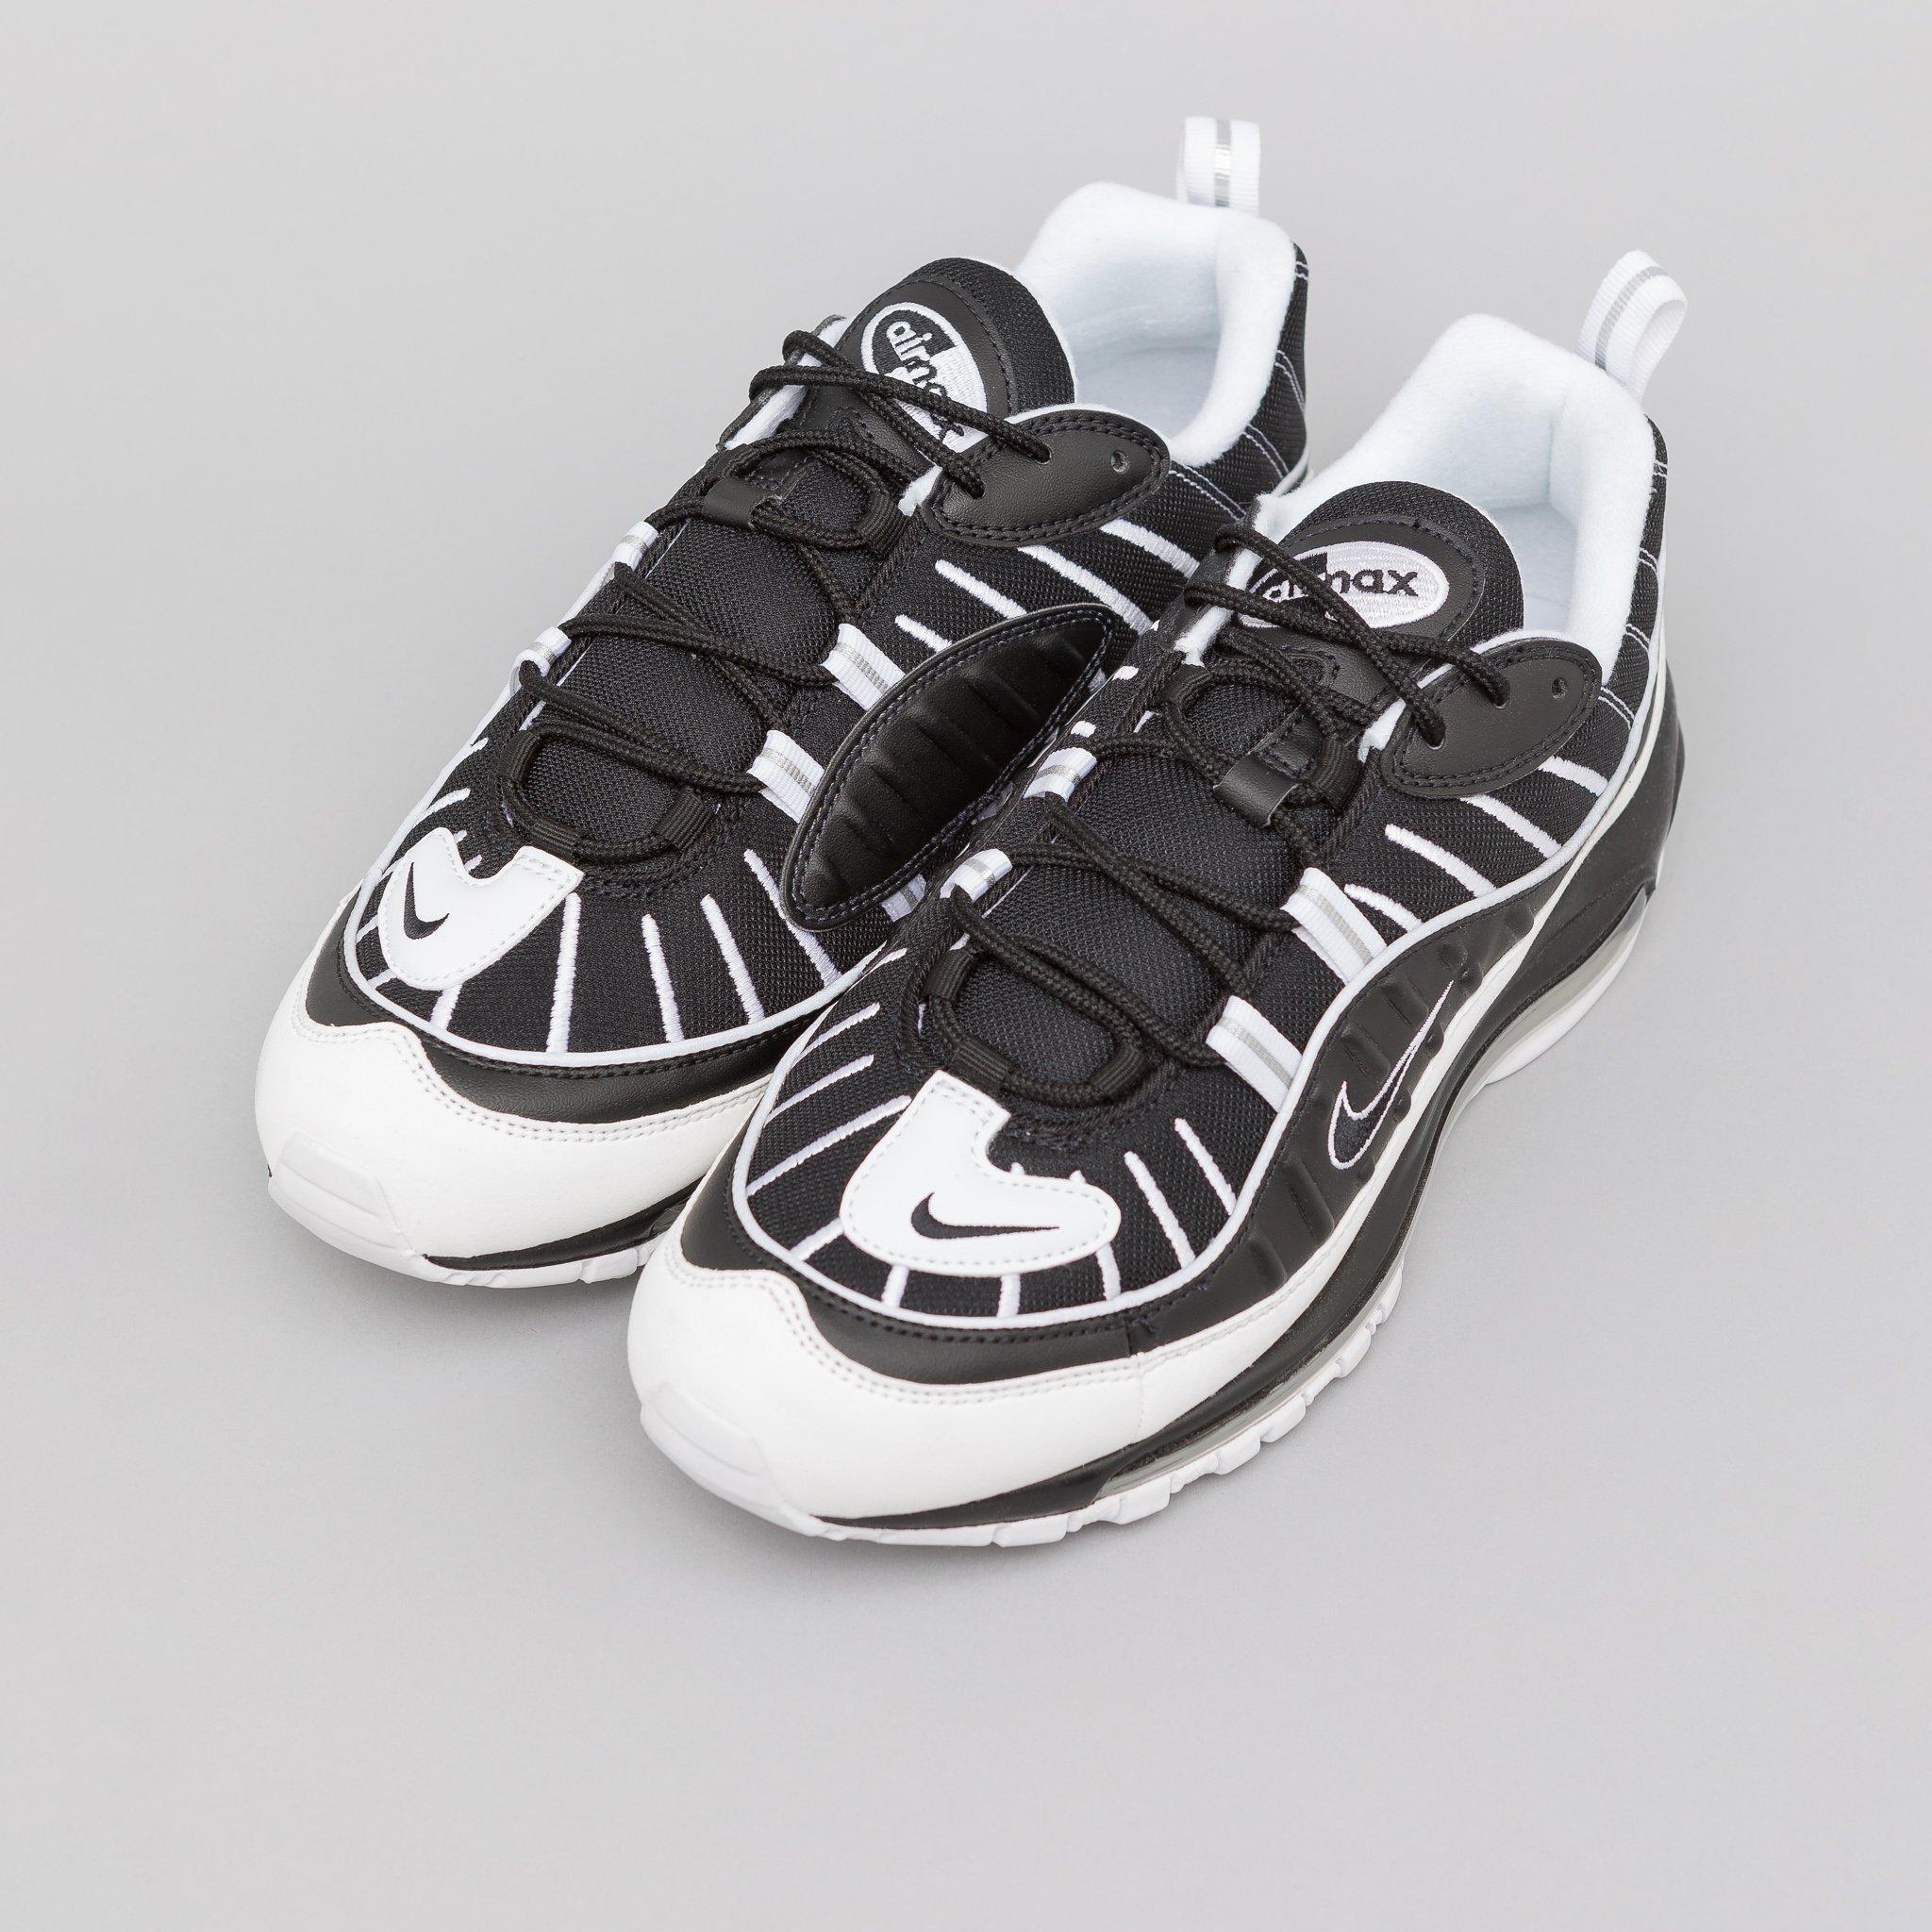 Nike - Metallic Air Max 98 In Black white Reflective Silver for Men - Lyst.  View fullscreen a1e818ea1